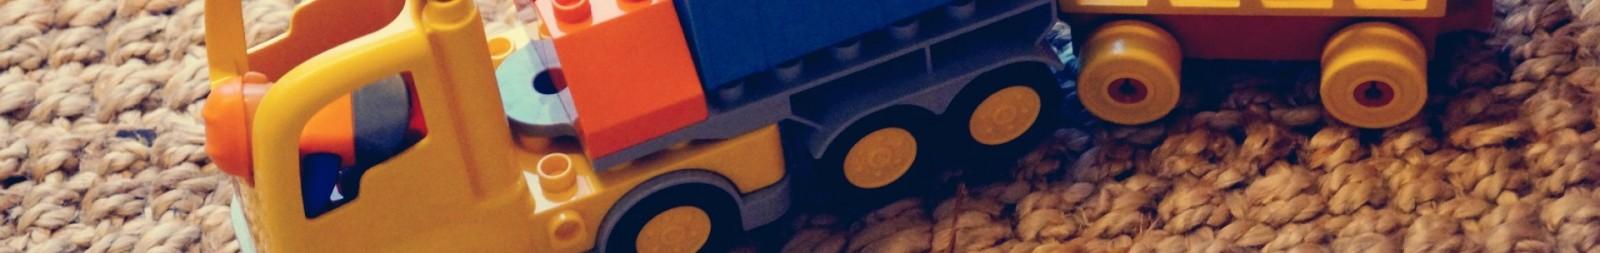 speelgoedbeurs 2021_web.jpg